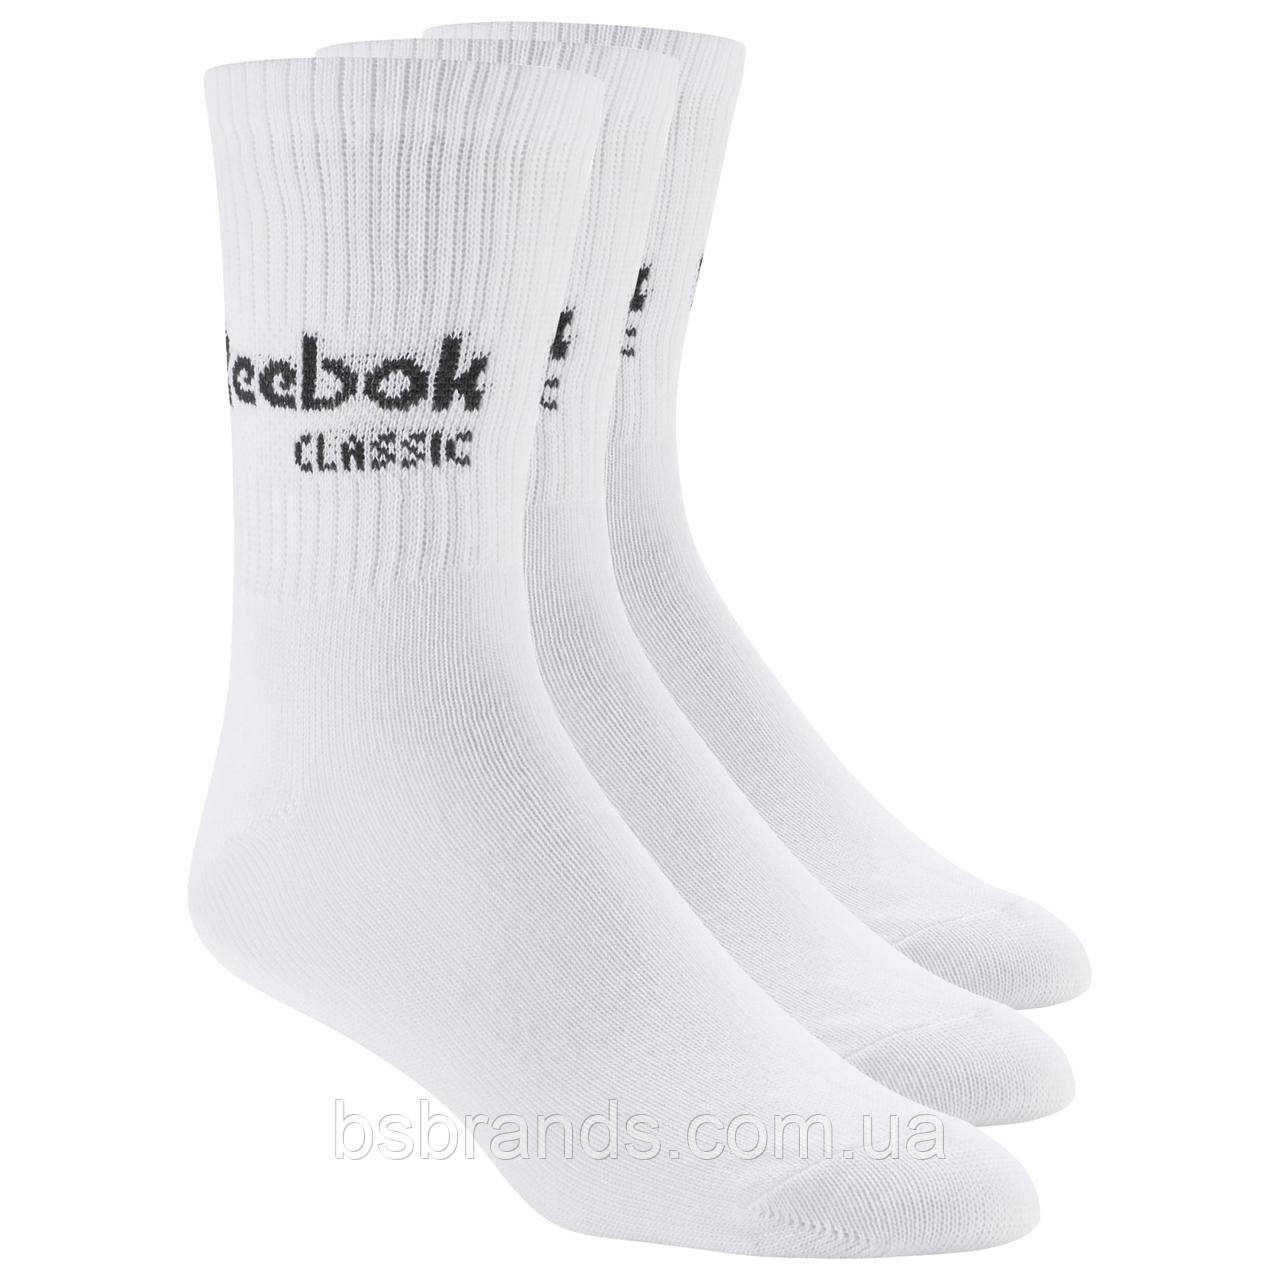 Спортивные носки Reebok Classics Core Crew, 3 пары CZ8013 (2020/1)